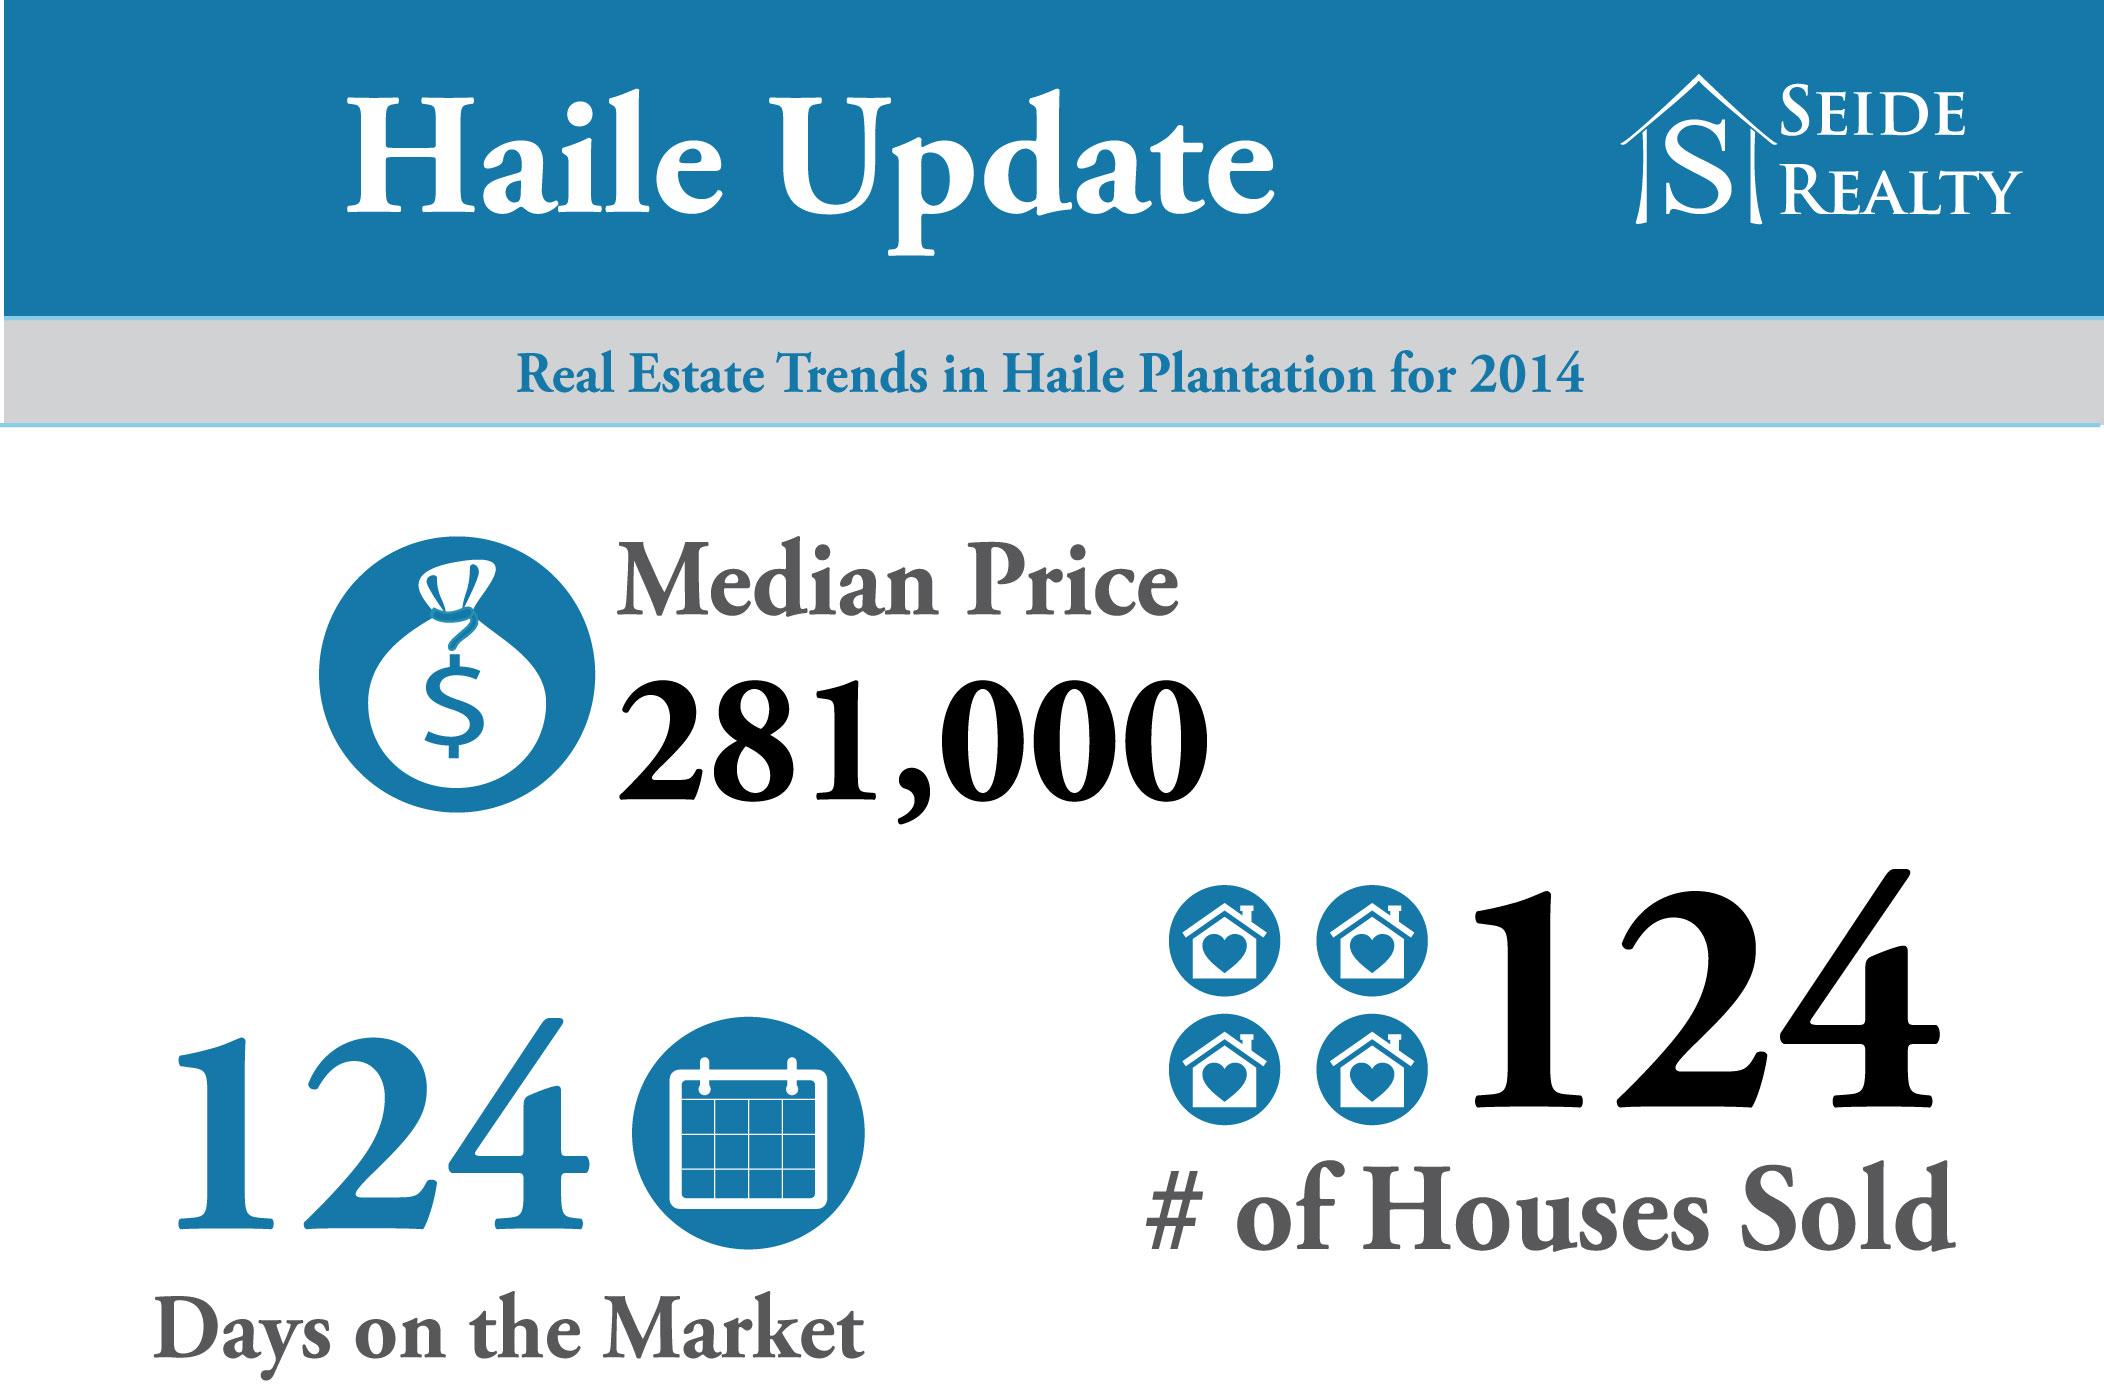 Haile Plantation Real Estate Trends